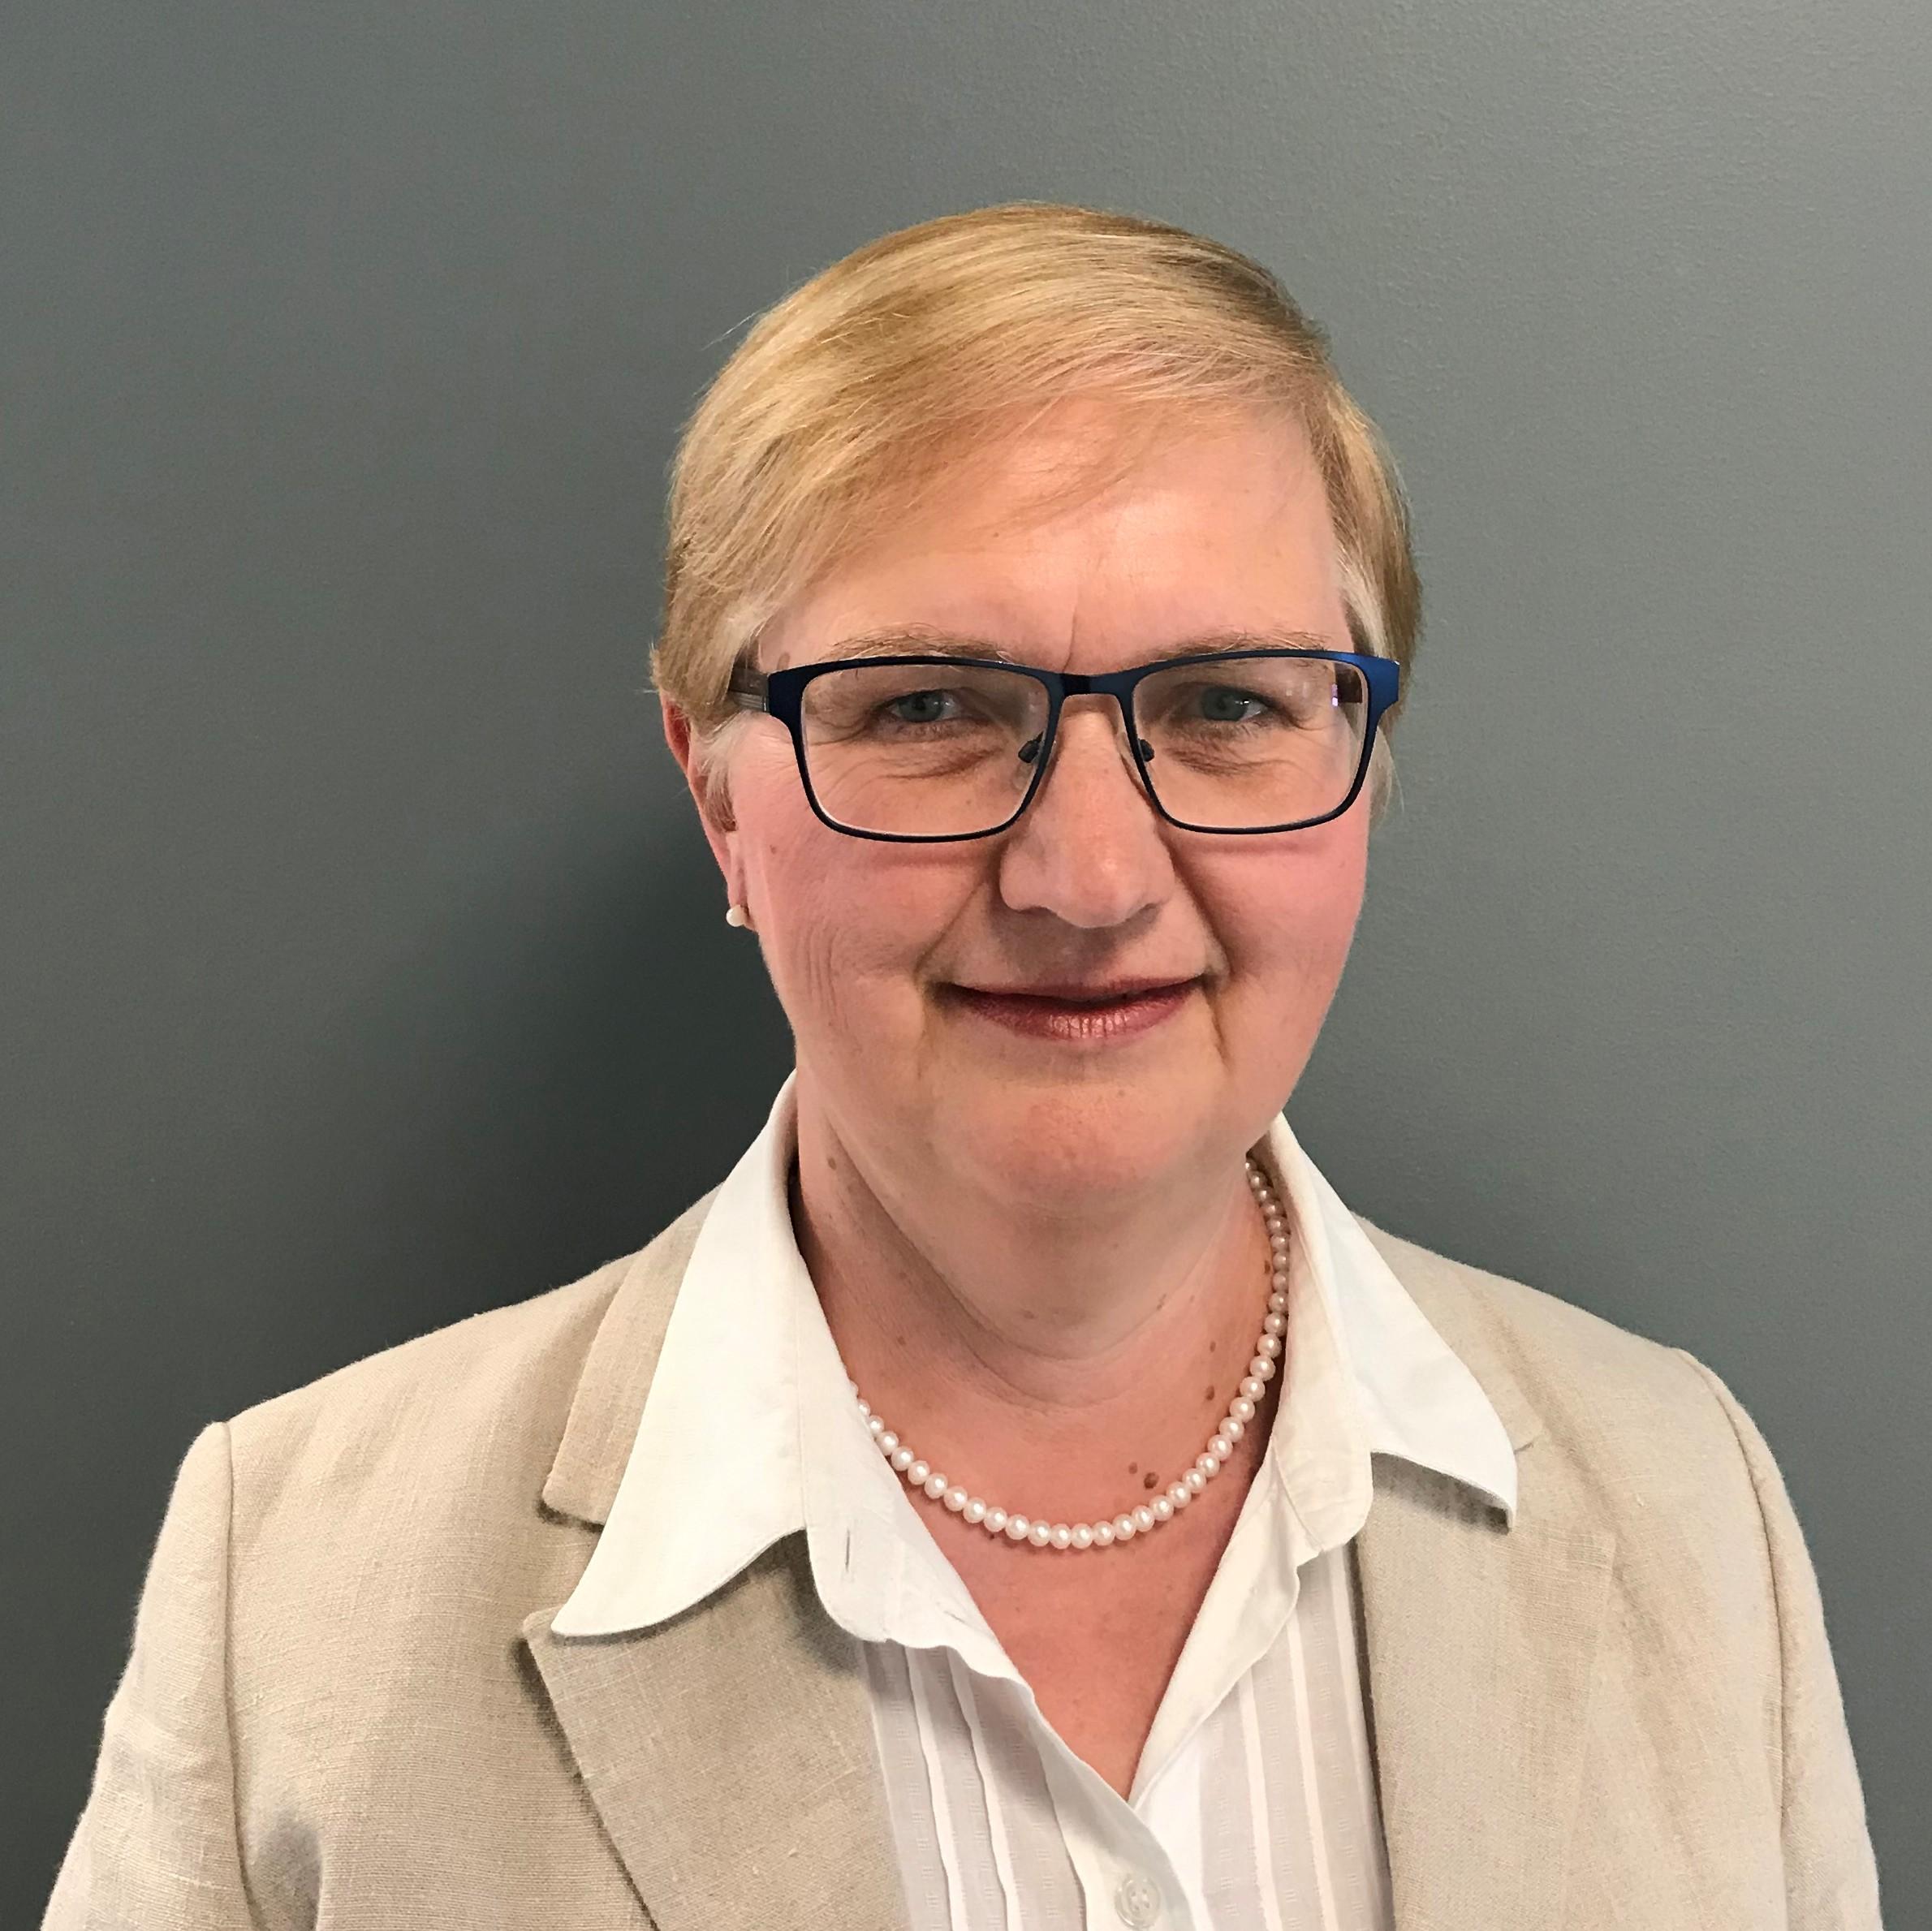 Lena Ramnemark